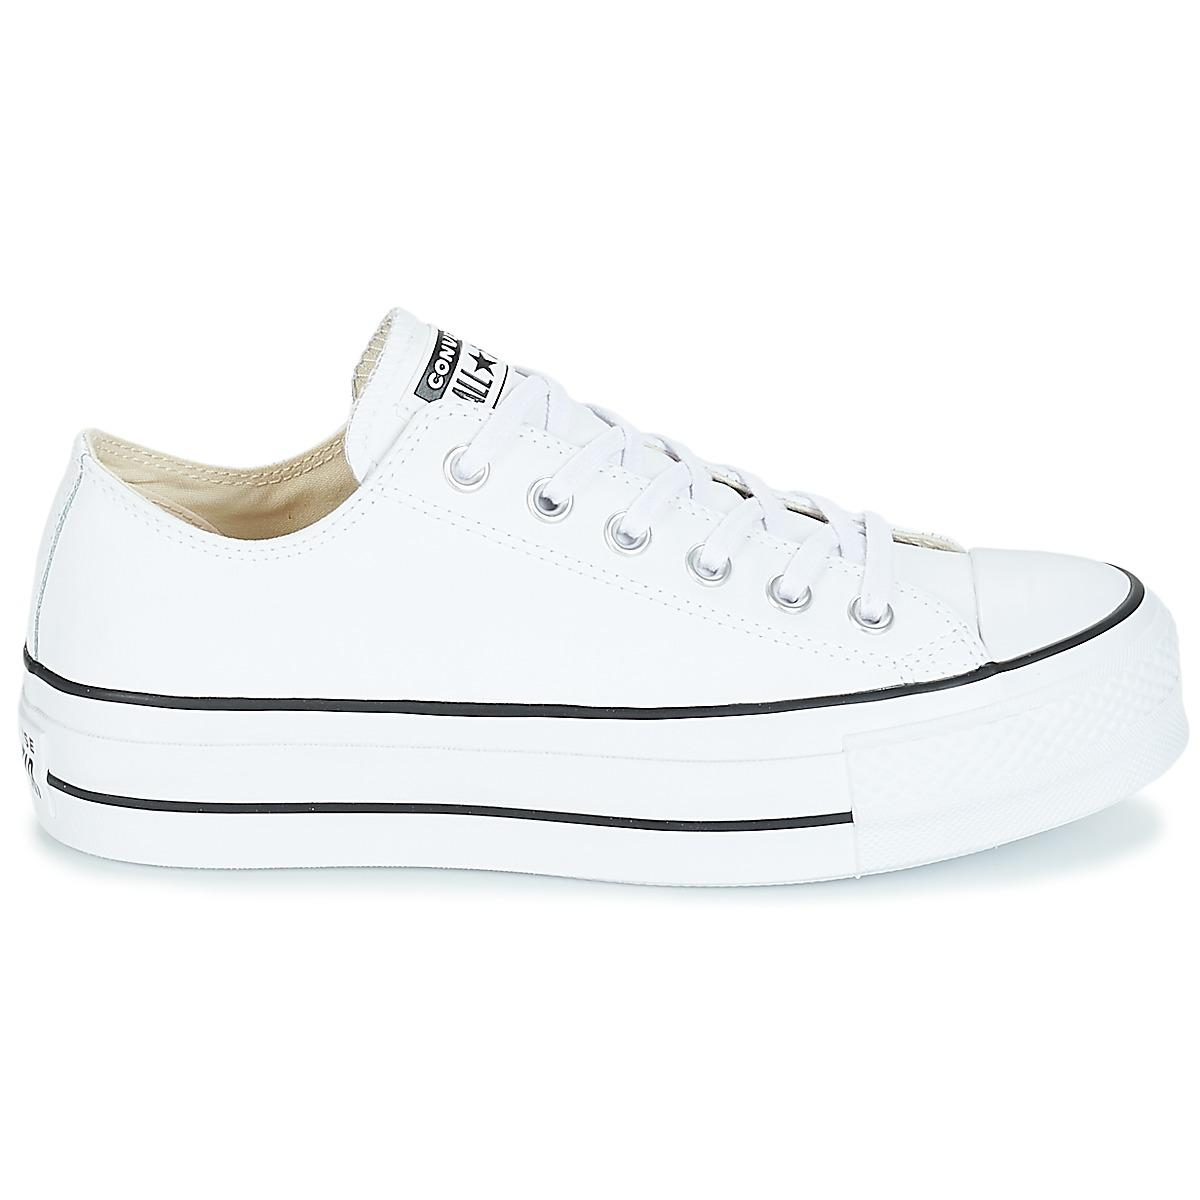 56ad87f57e8cf Converse - White CHUCK TAYLOR ALL STAR LIFT CLEAN OX femmes Chaussures en  blanc - Lyst. Afficher en plein écran